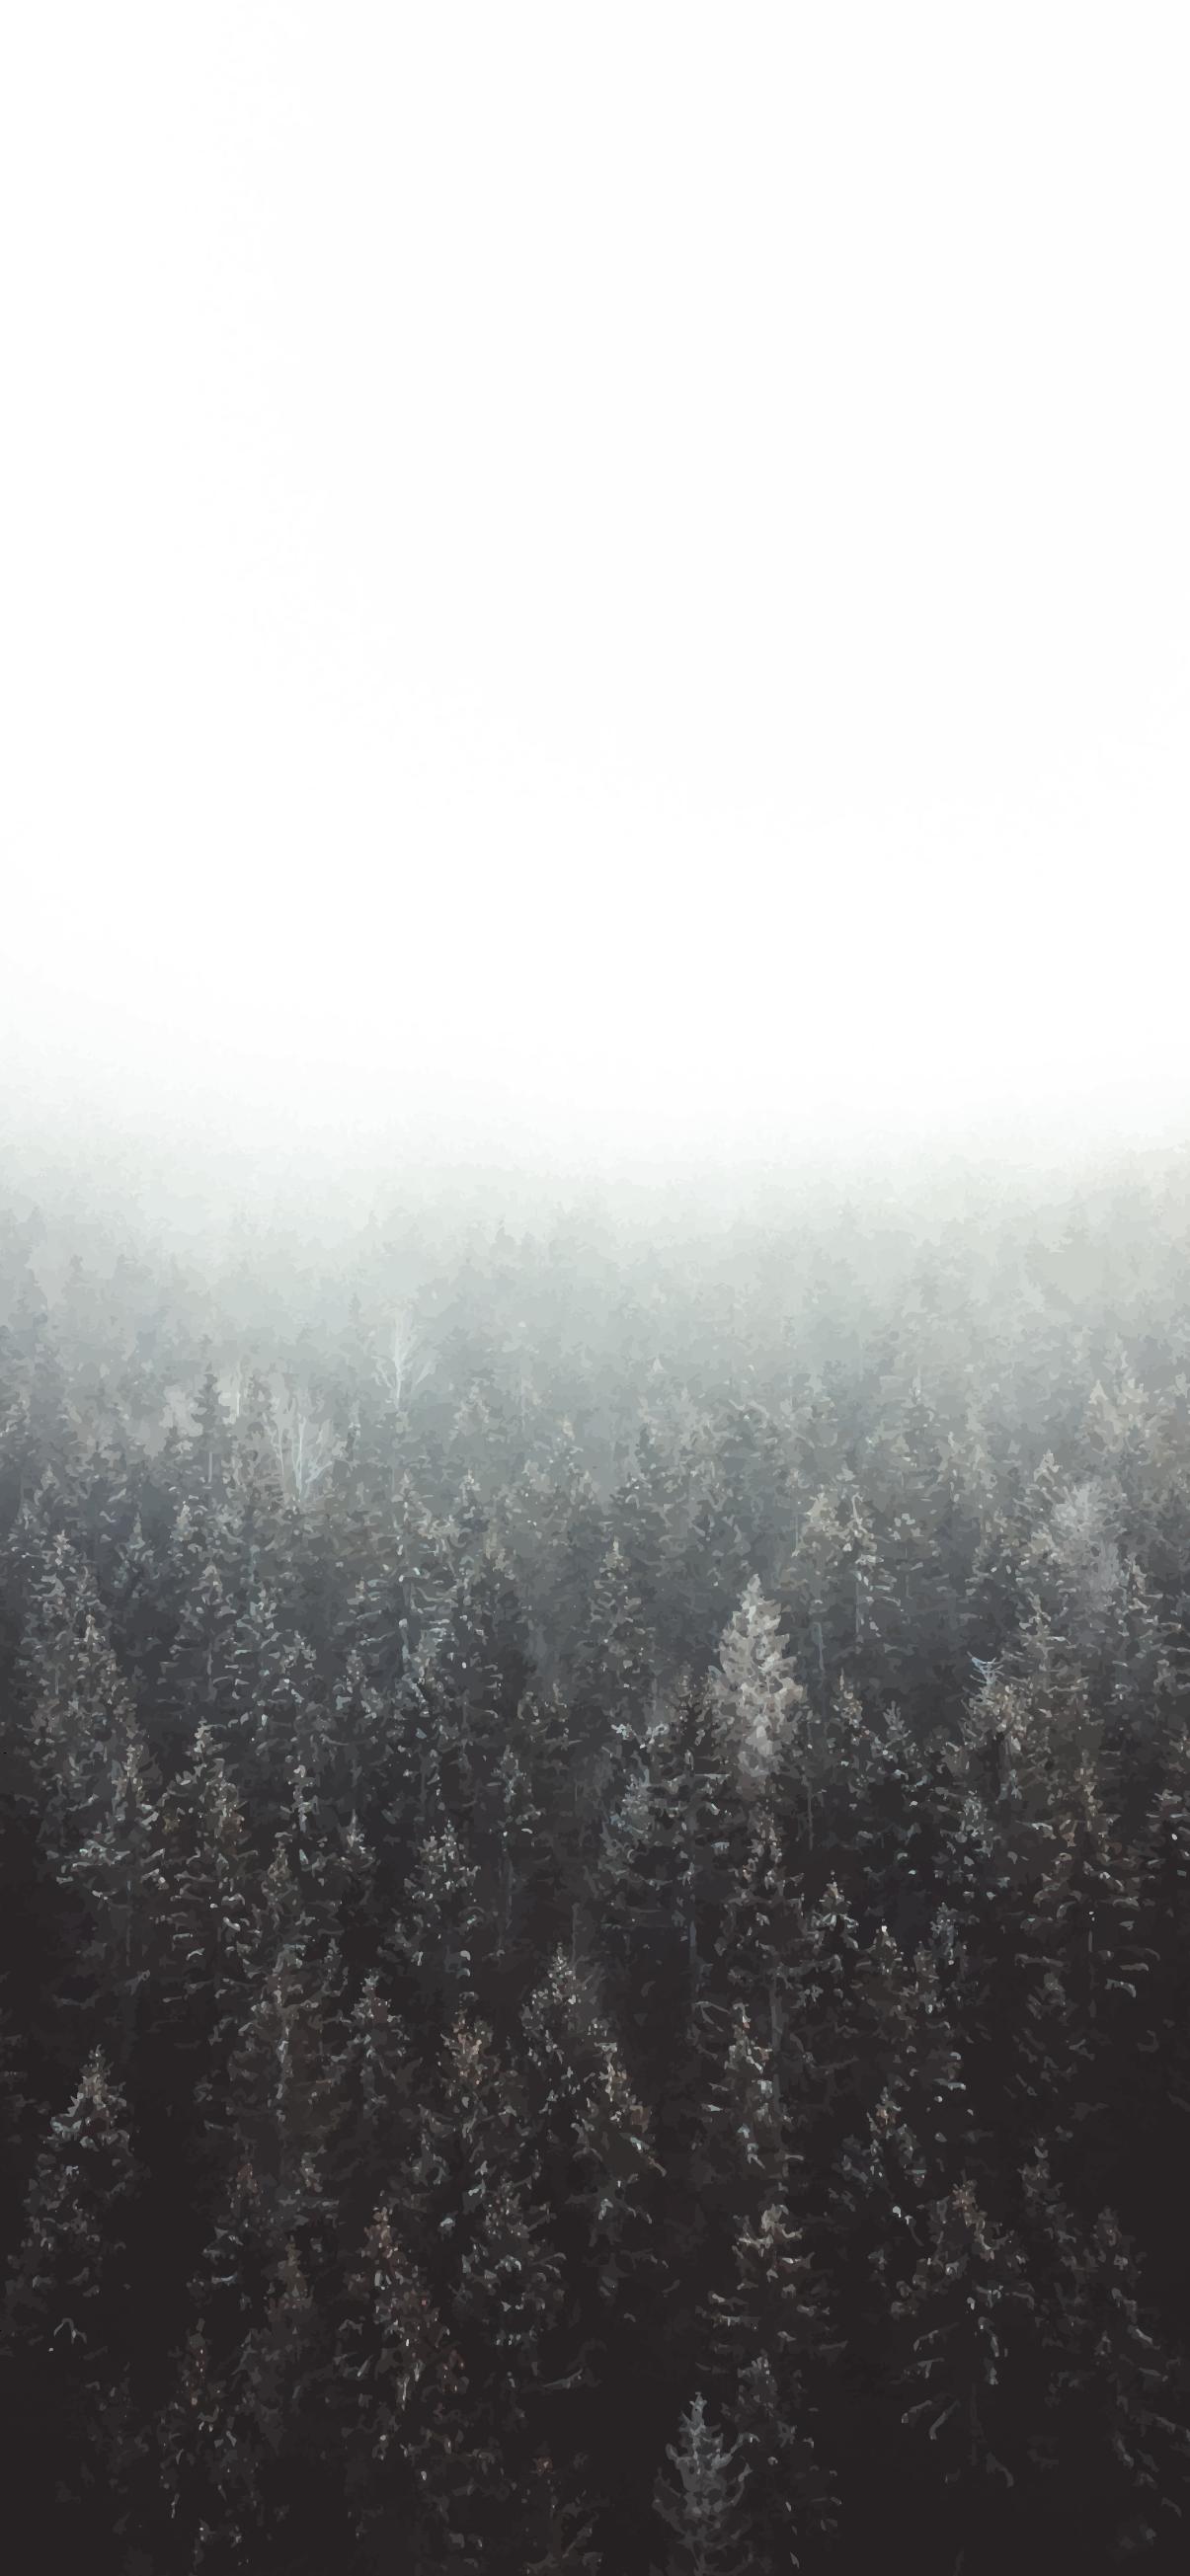 bw forest wallpaper 4k for phone ios theme background lockscreen homescreen screensaver